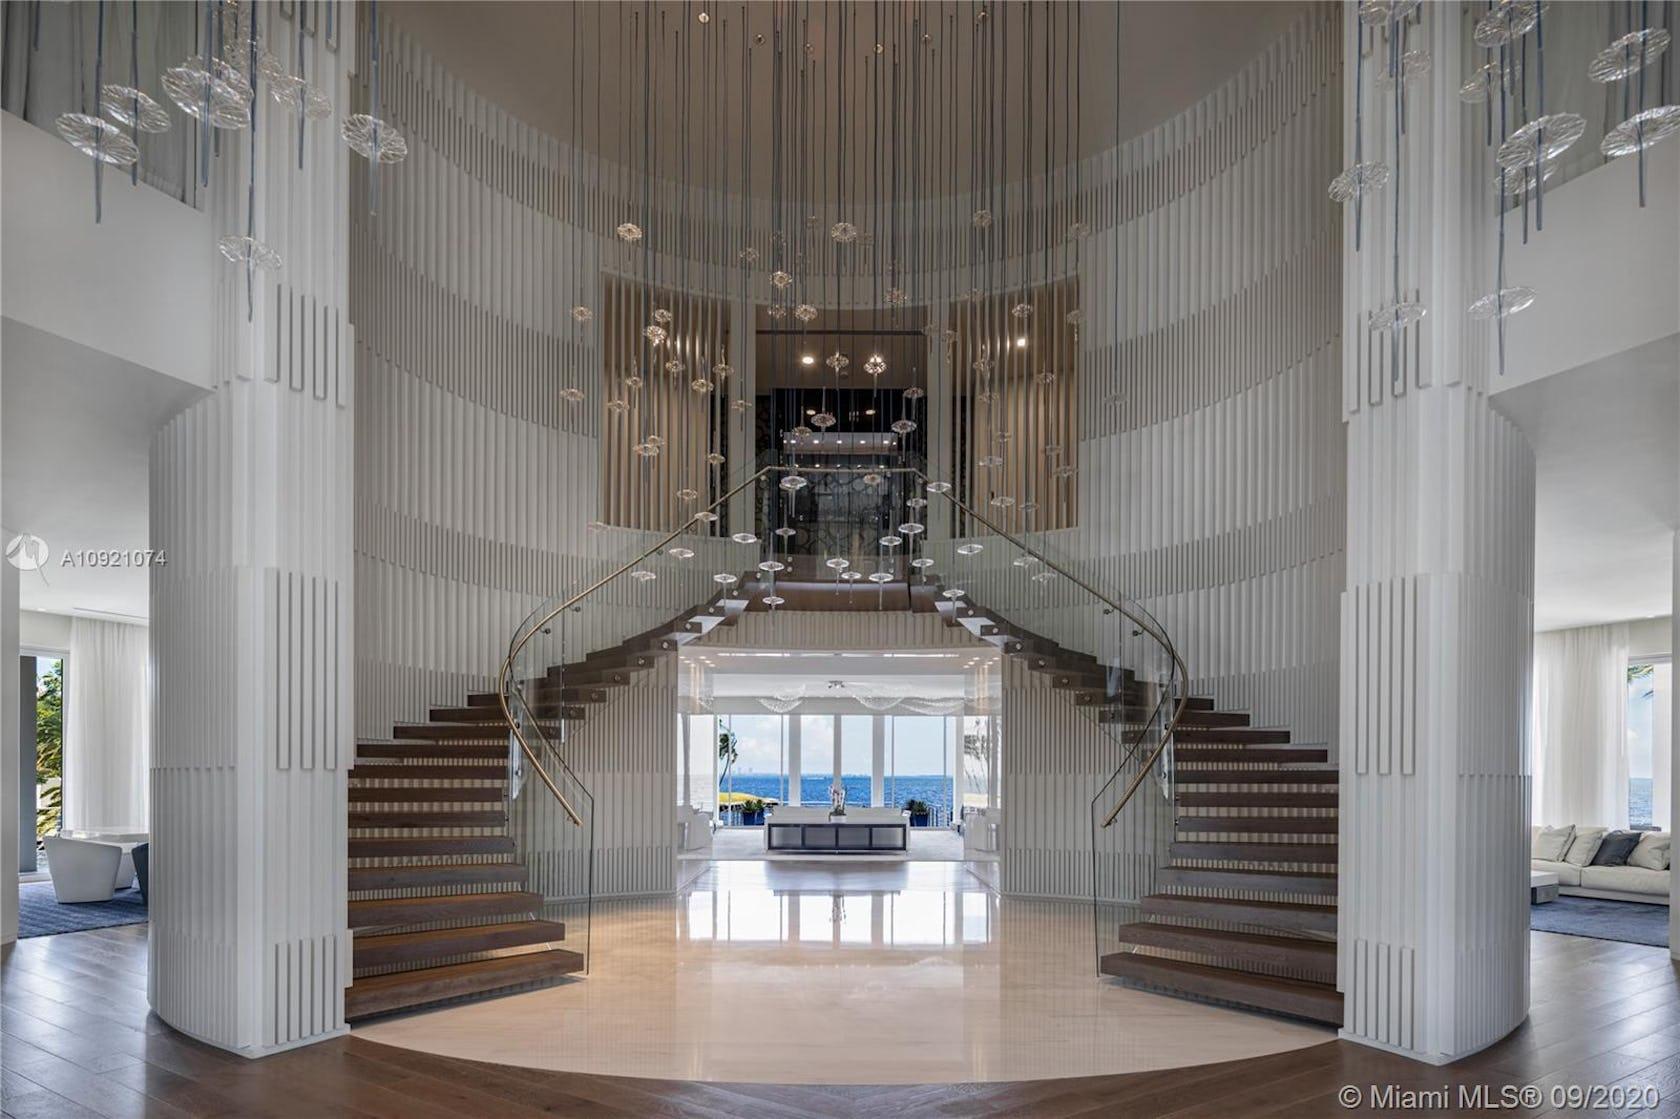 handrail banister flooring floor lobby room indoors interior design staircase lighting